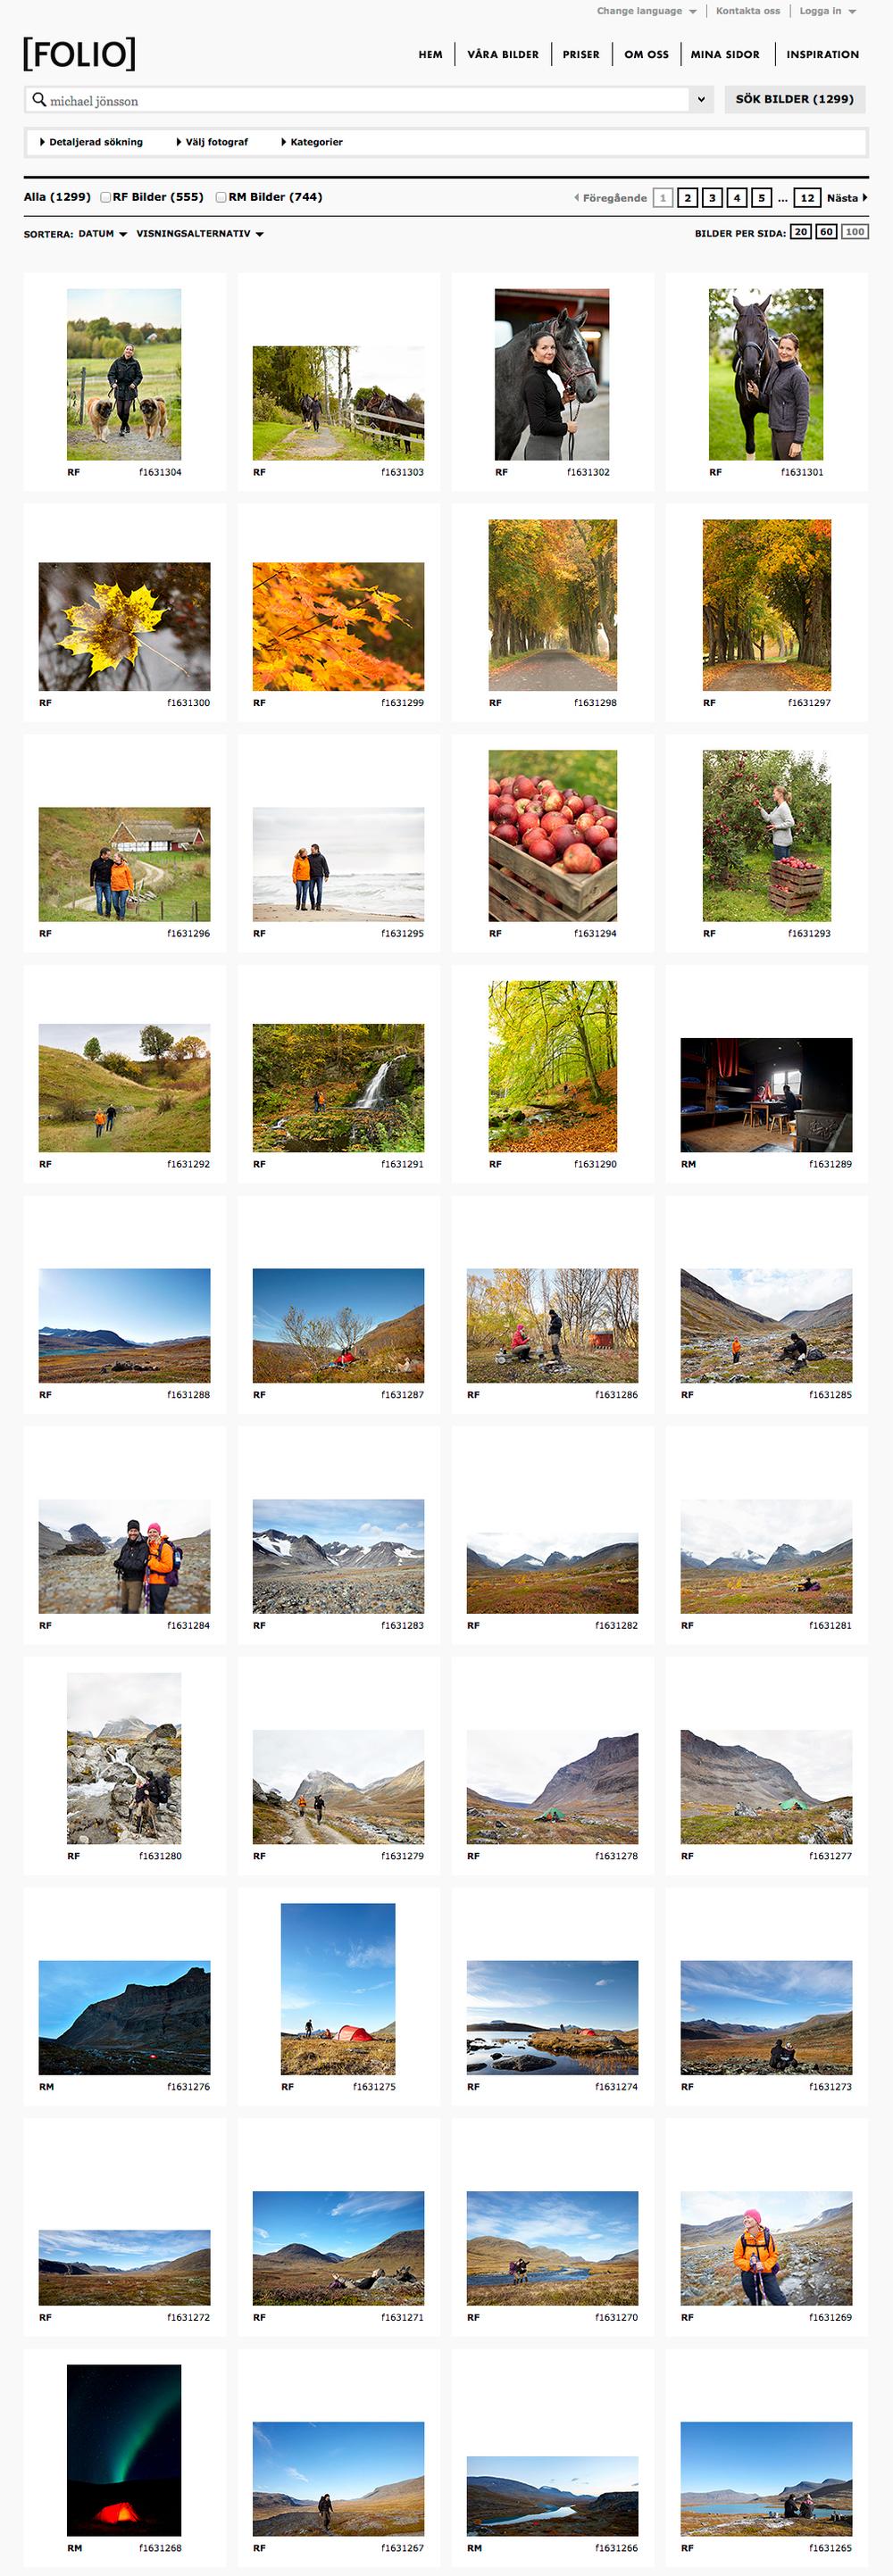 20131125-folio-vegafoto.jpg